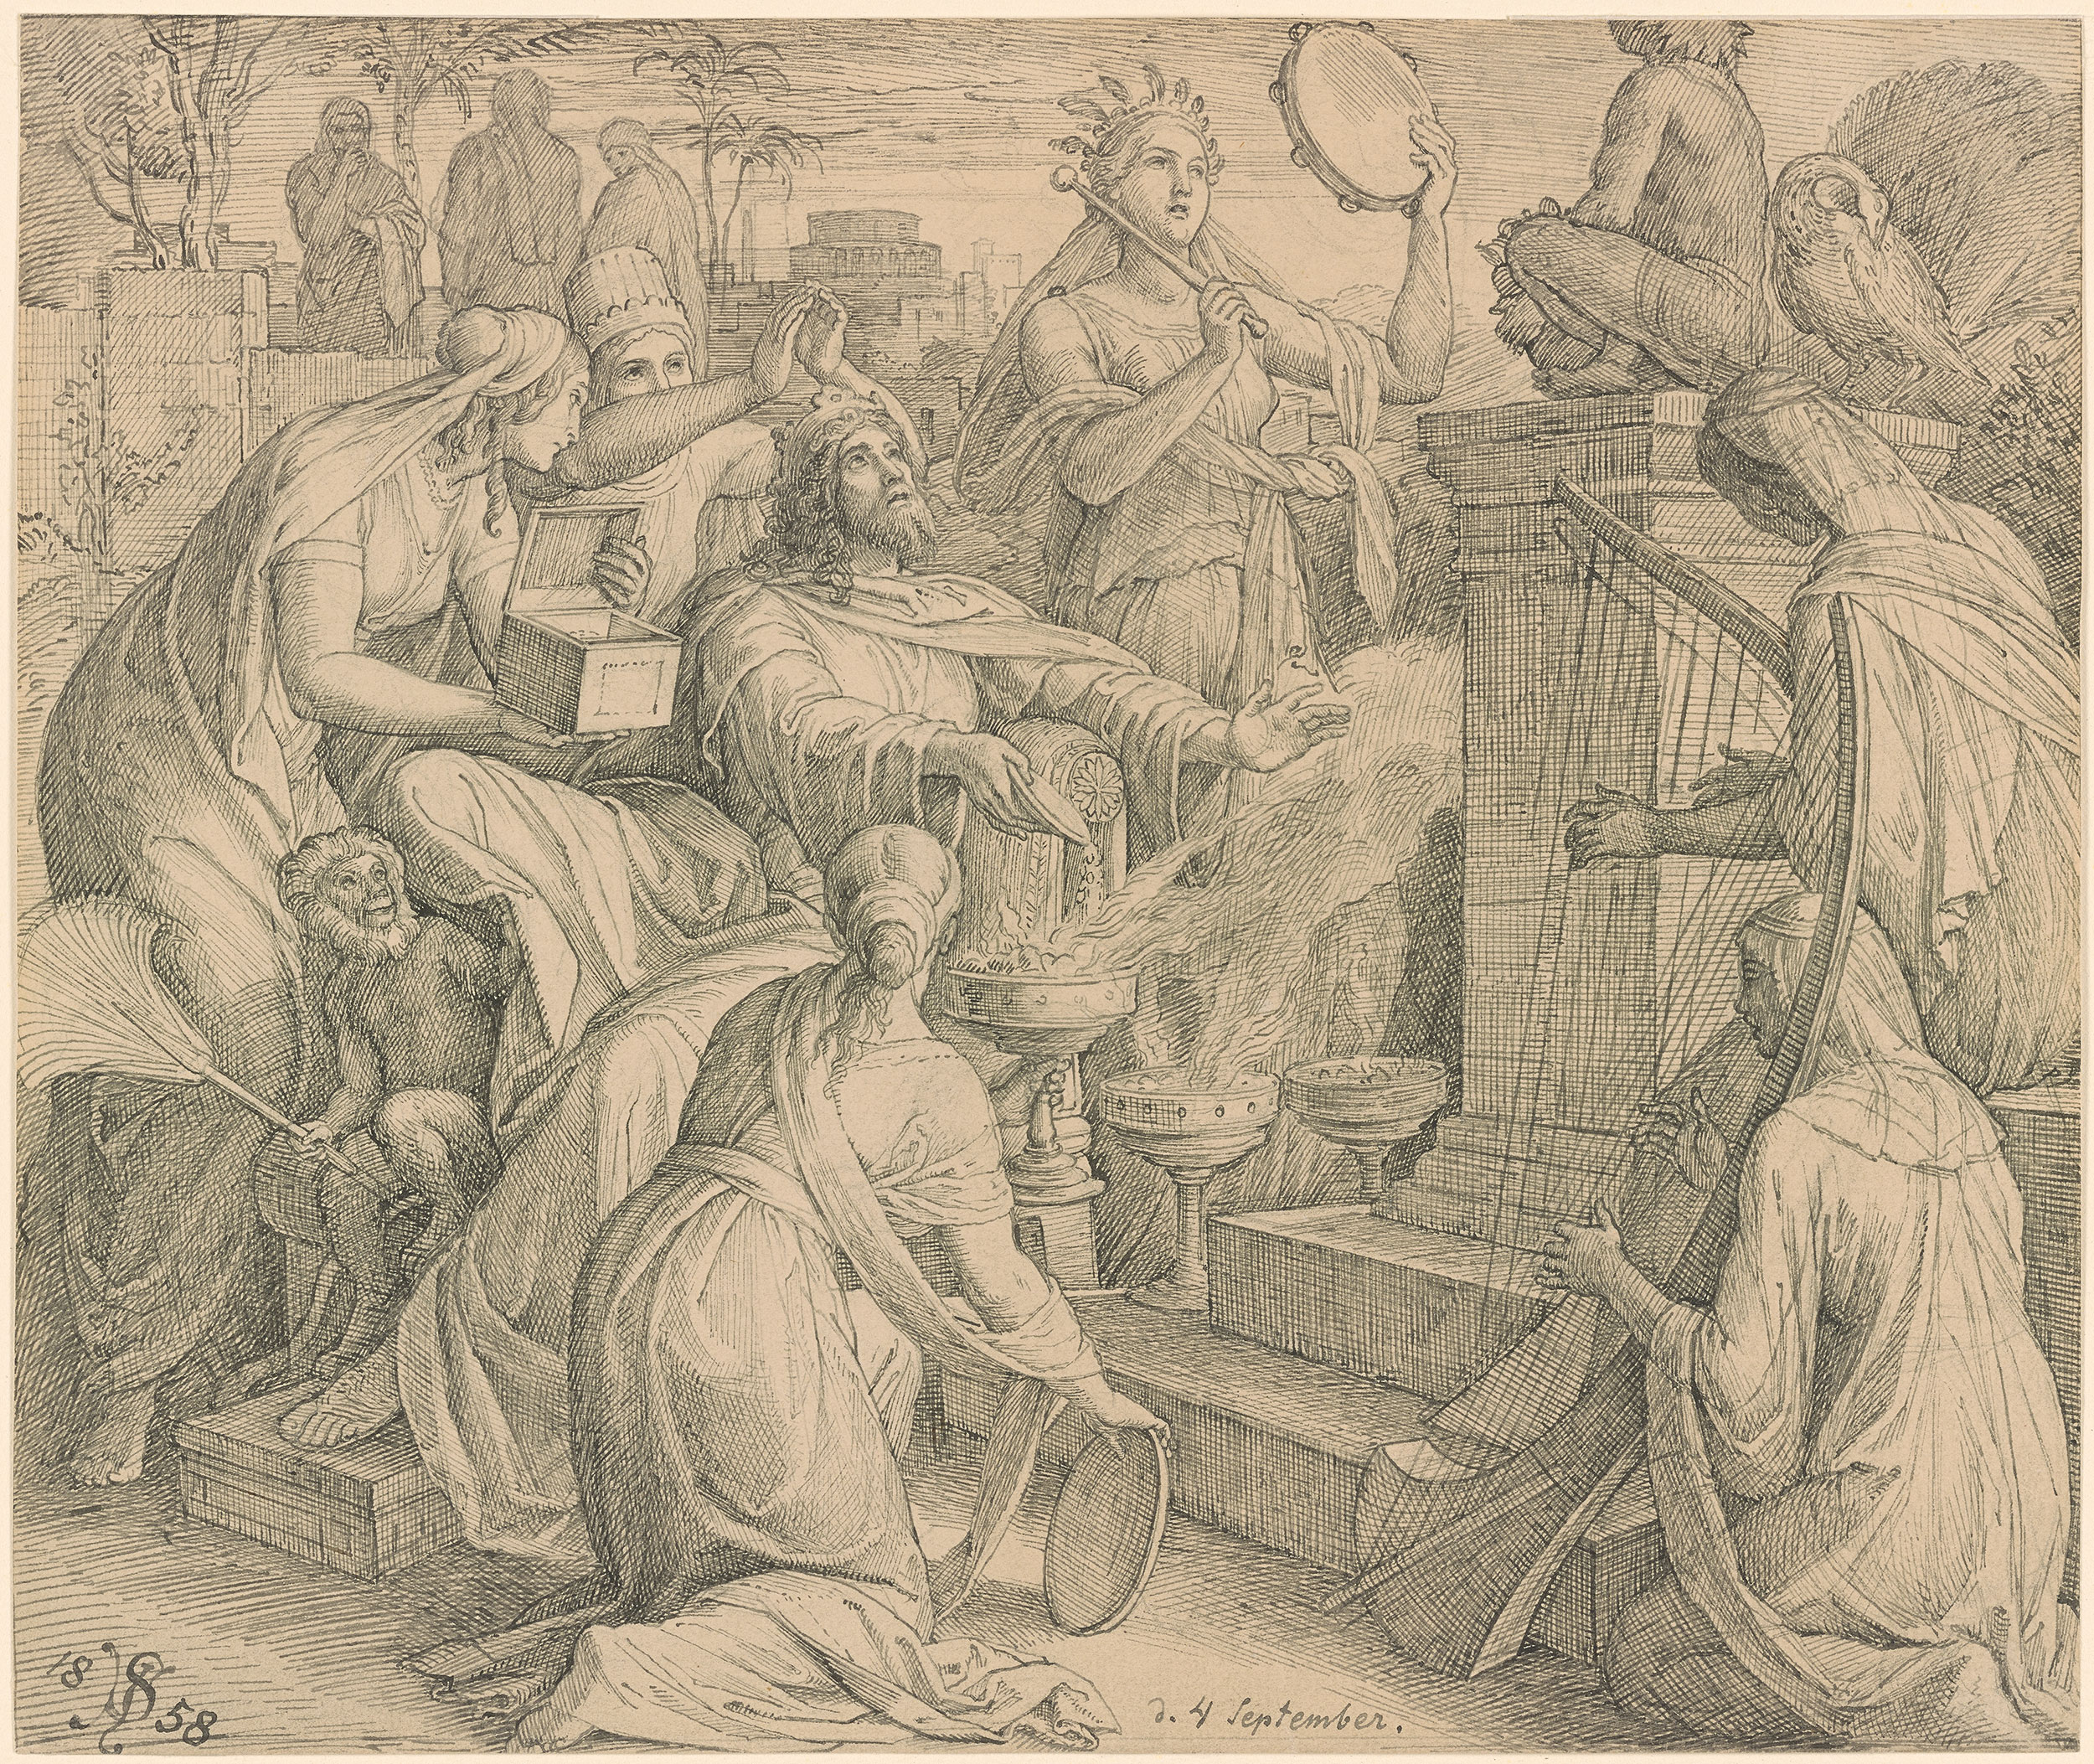 Julius Schnorr Von Carolsfeld Drawings 144783v_0001.jpg